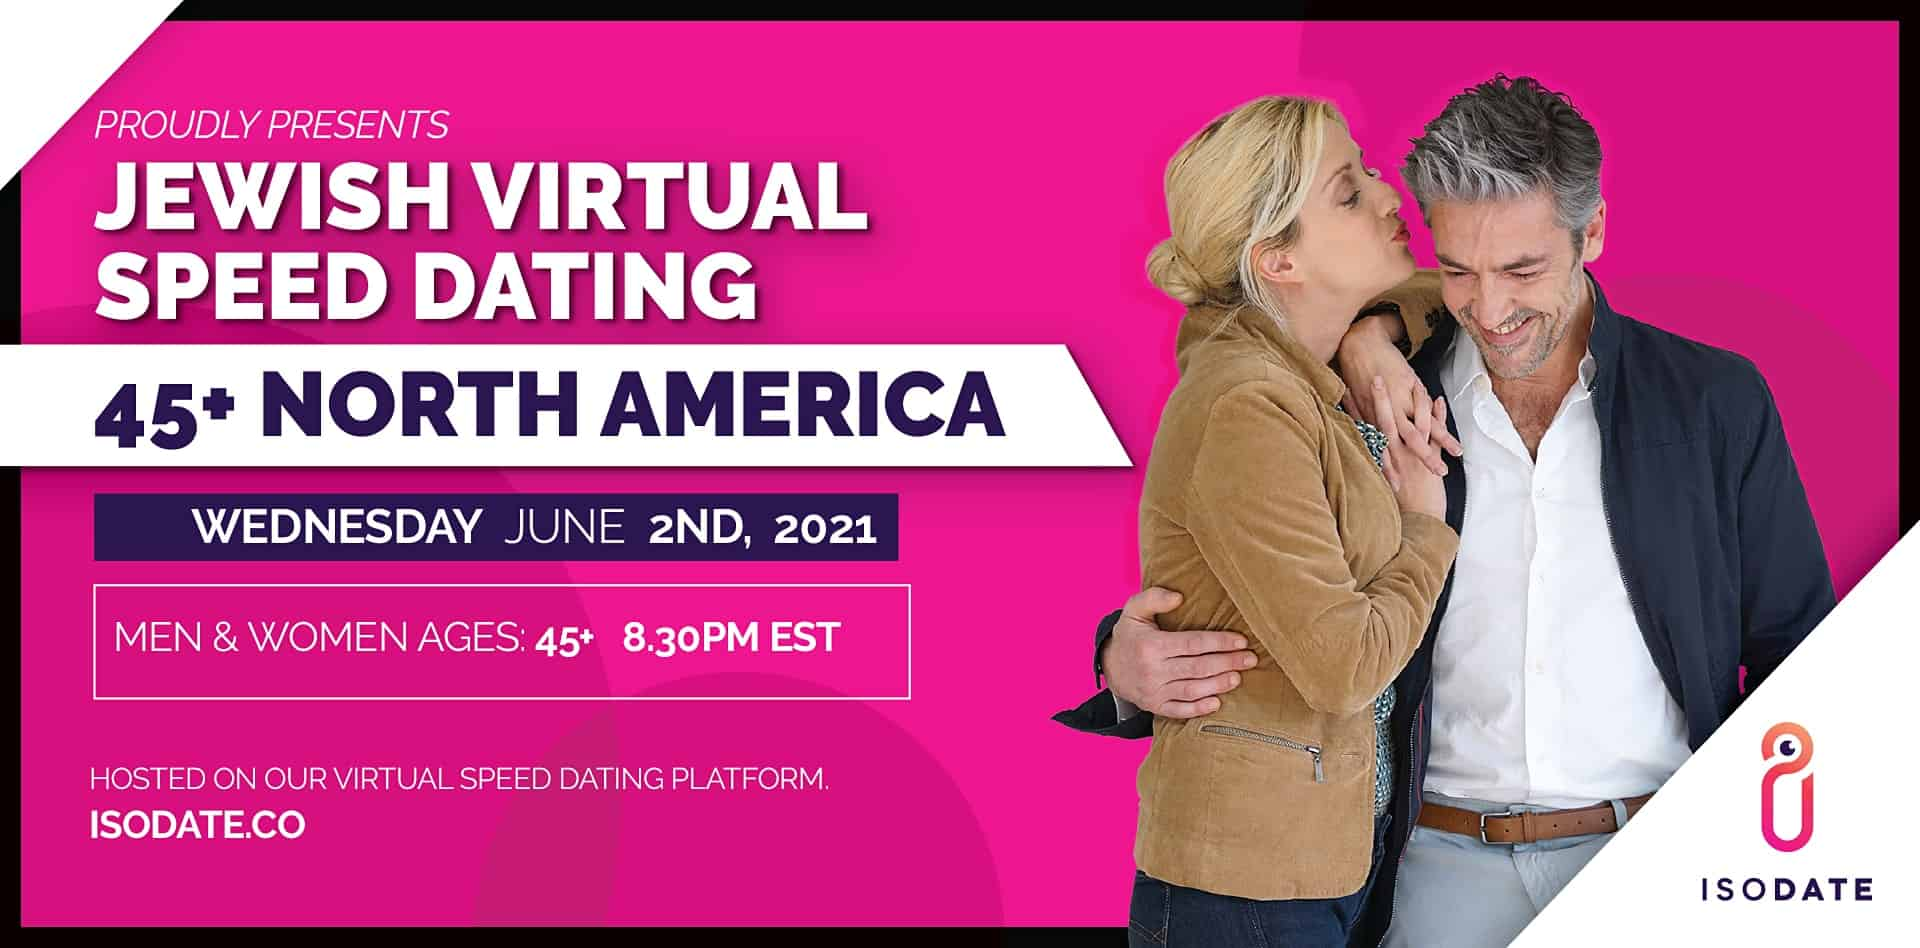 Isodate's 45+ Jewish Virtual Speed Dating